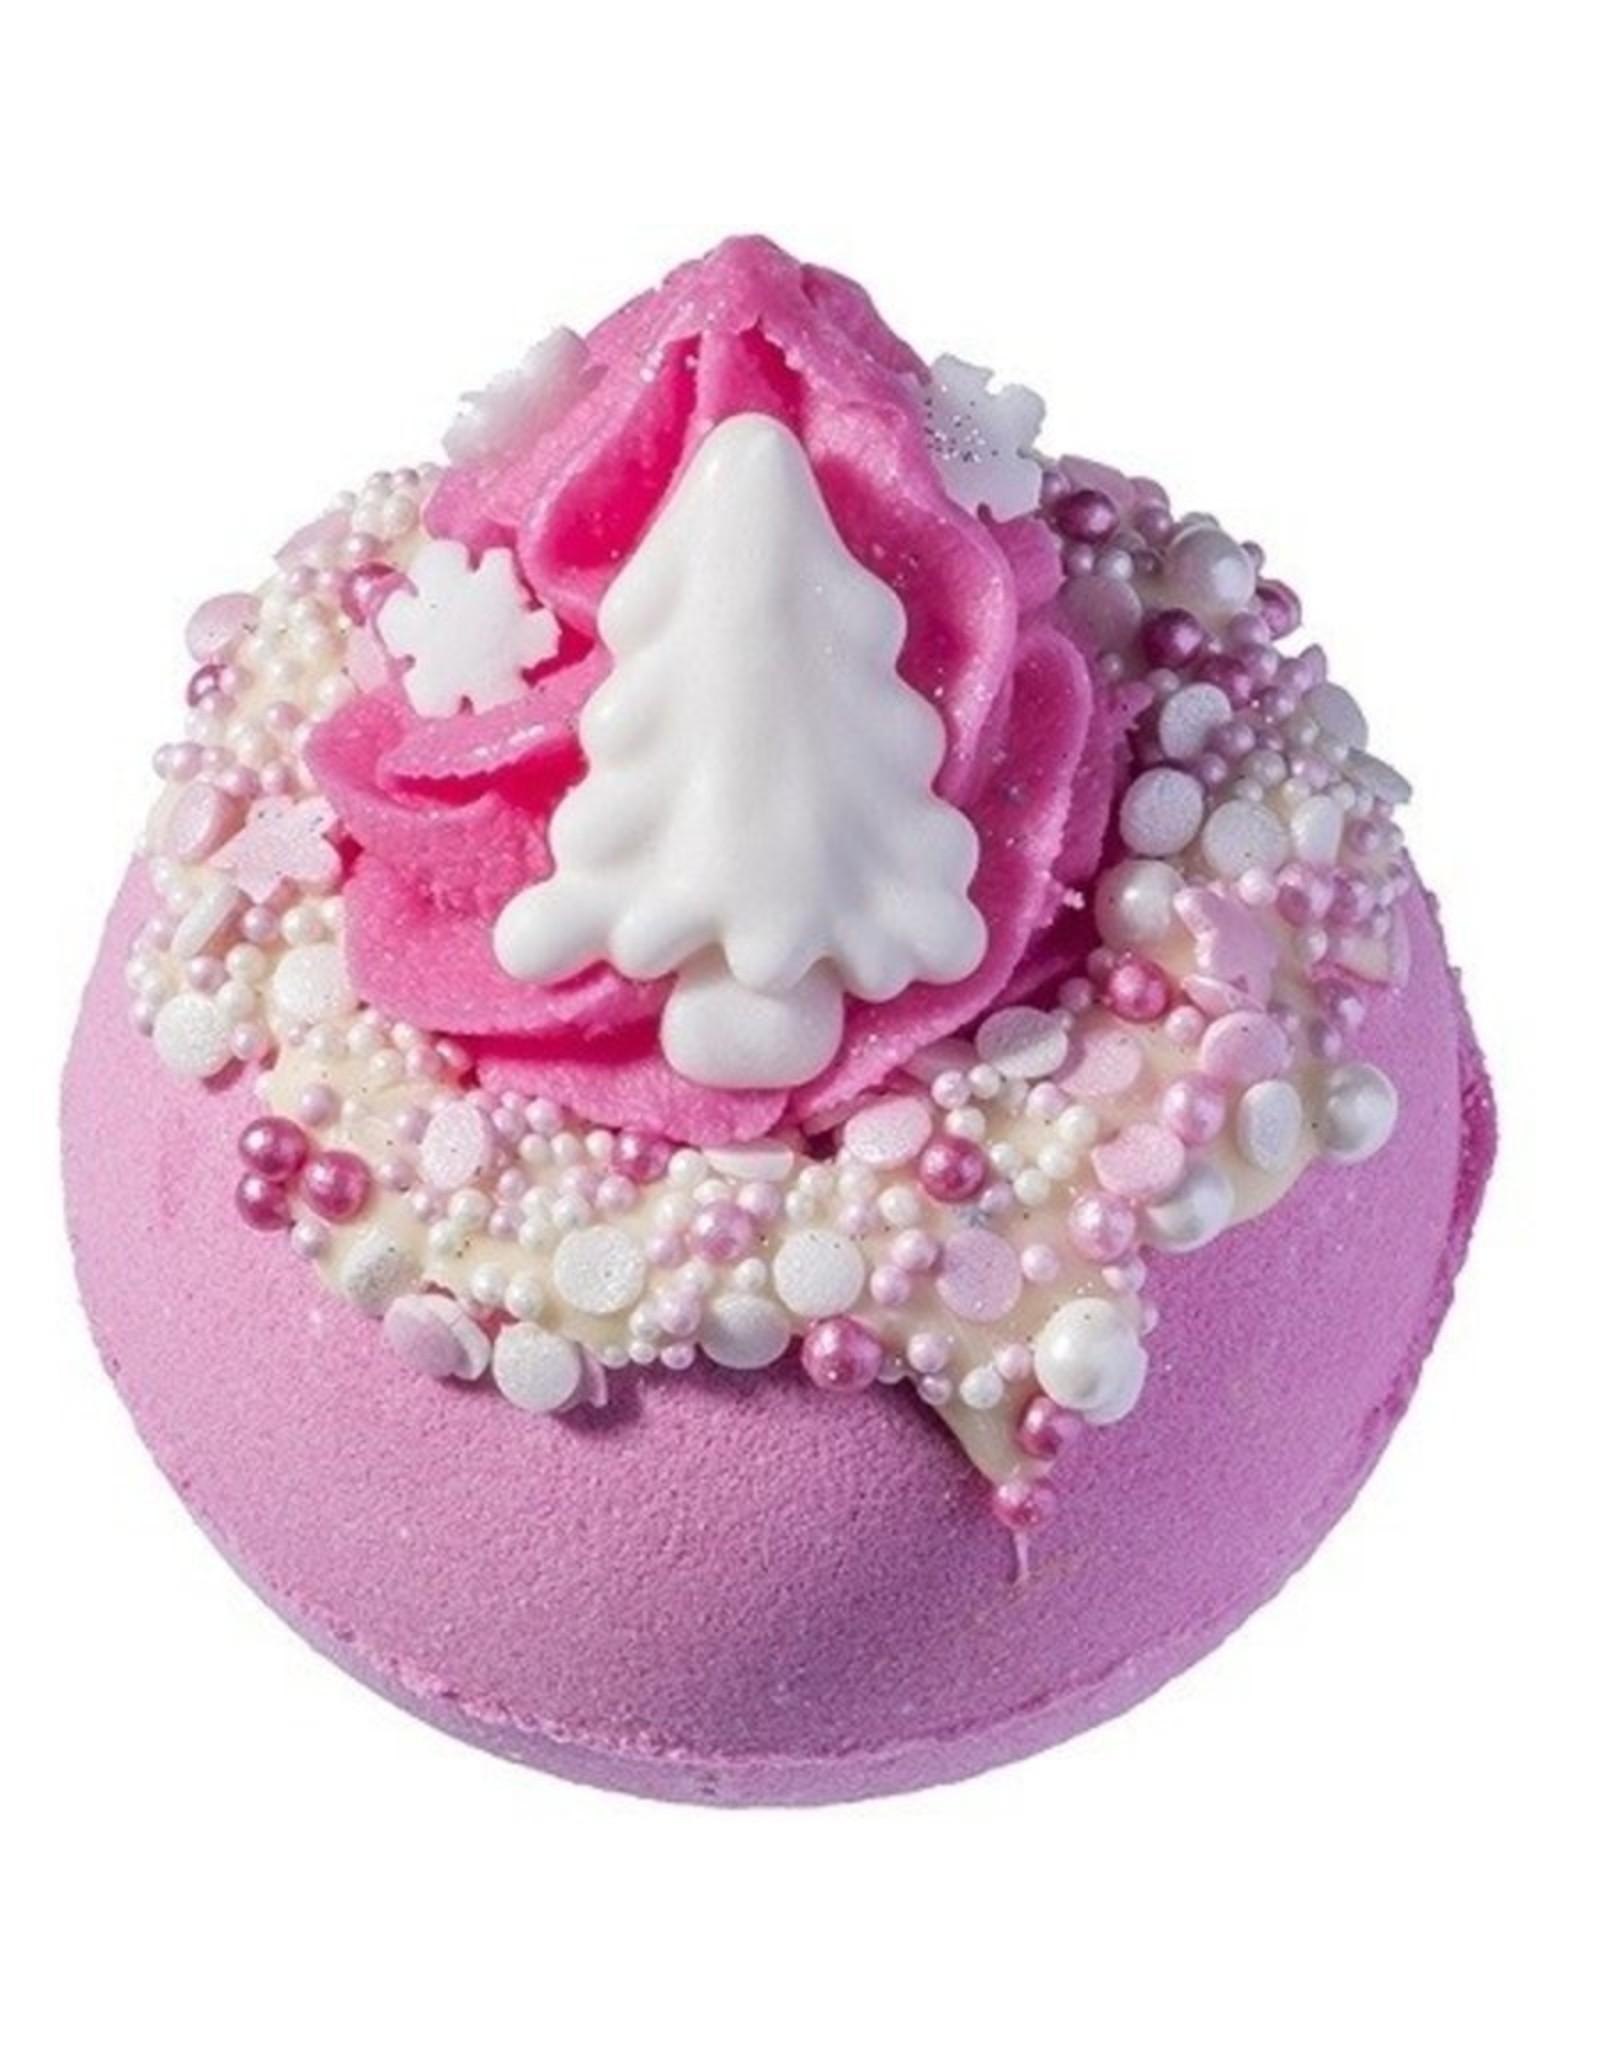 Bomb Cosmetics Bath Blaster 'Pink Christmas' - Body & Soap